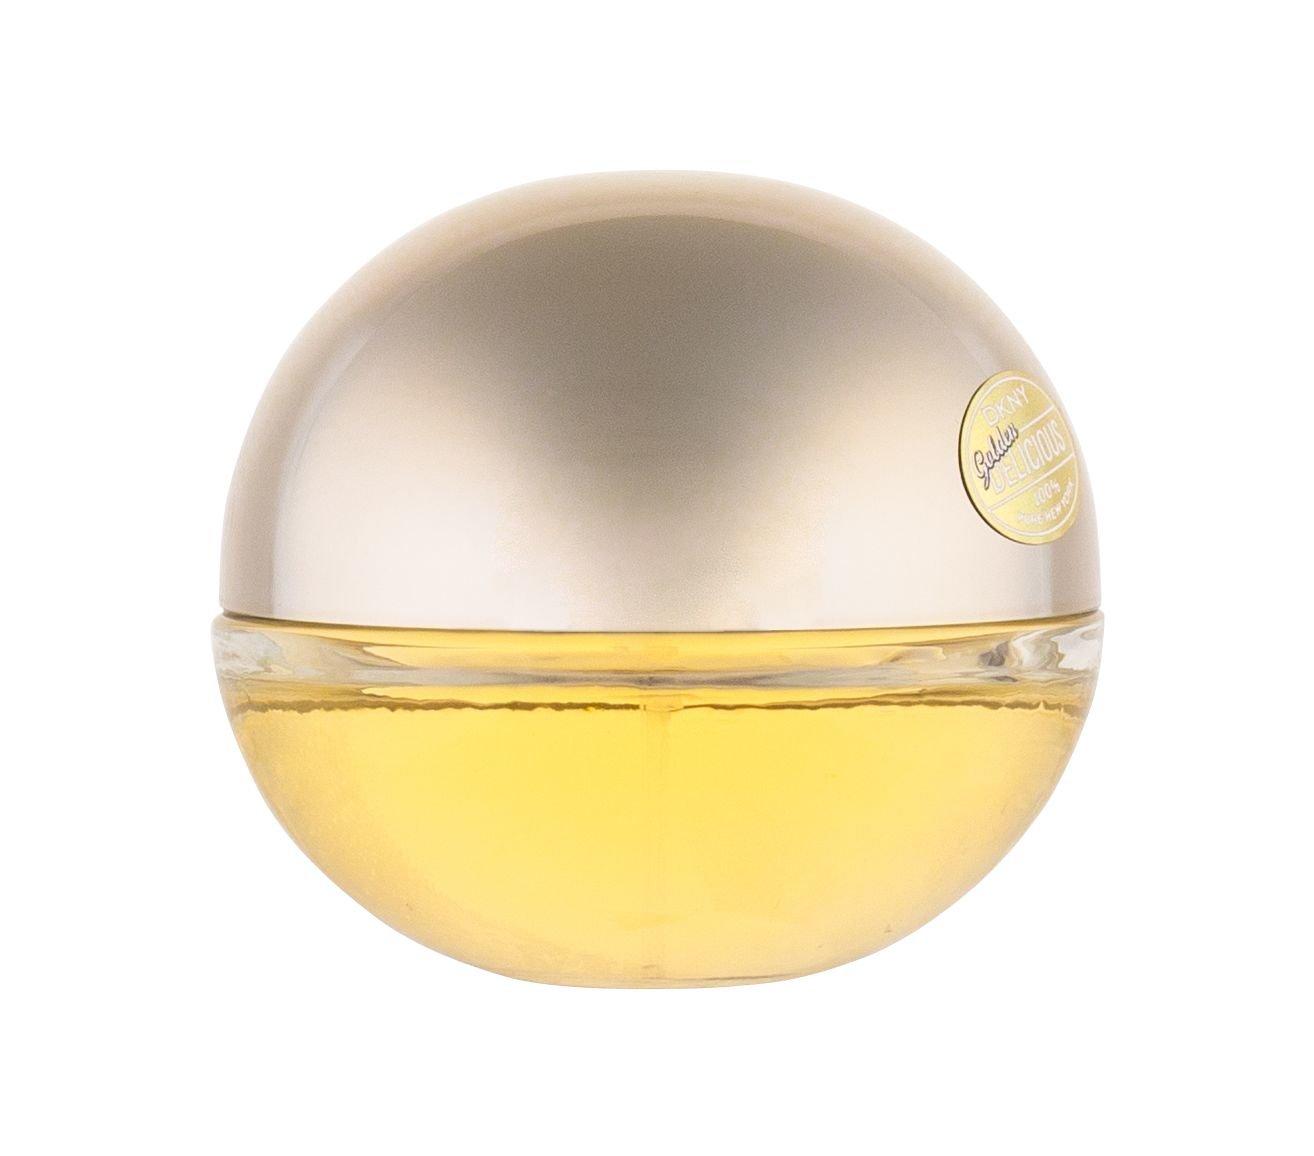 DKNY DKNY Golden Delicious EDP 30ml